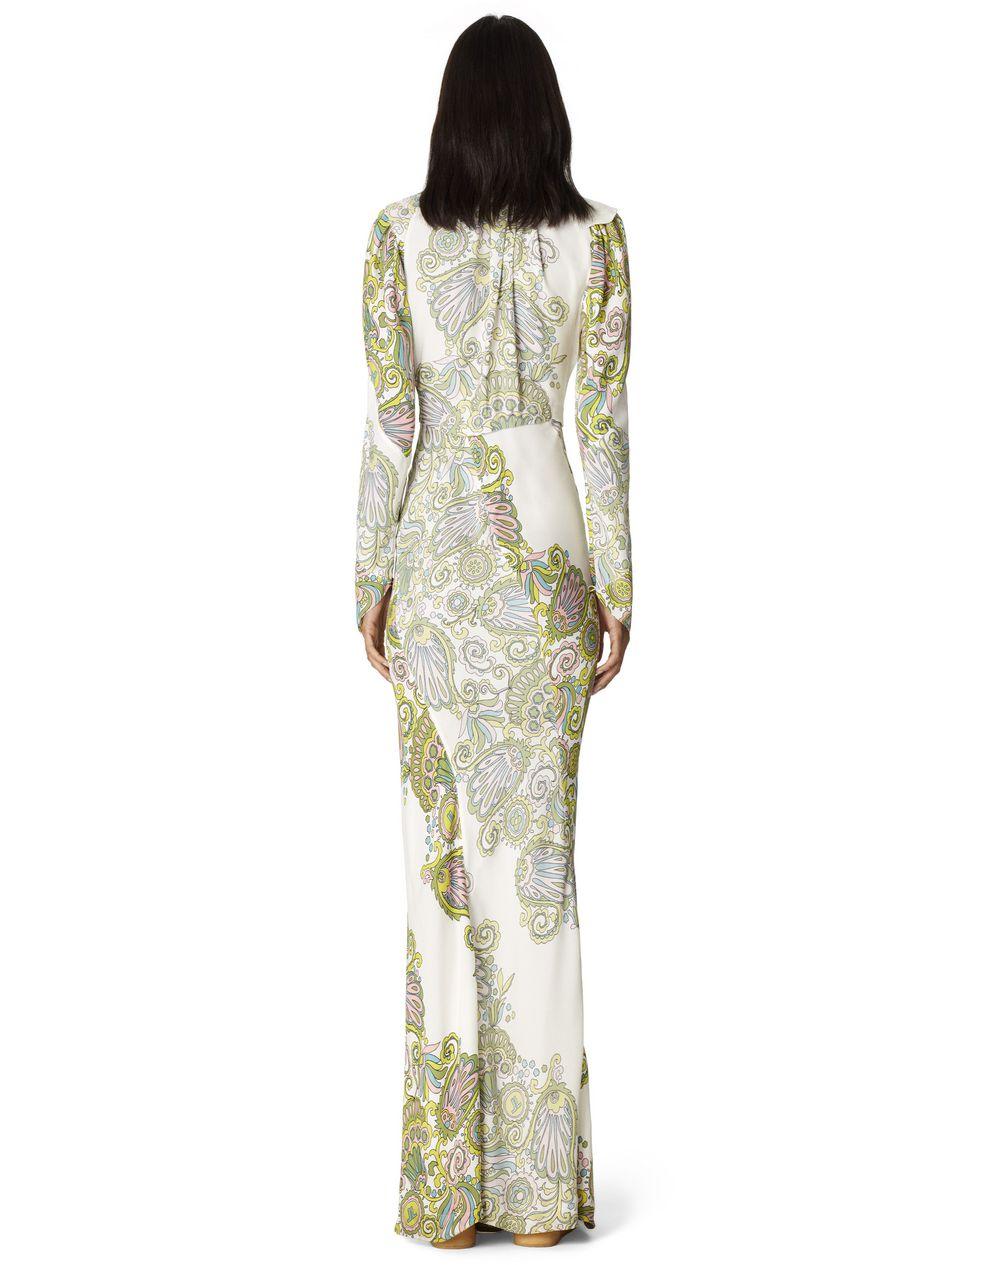 LONG FLOWER PRINT DRESS - Lanvin